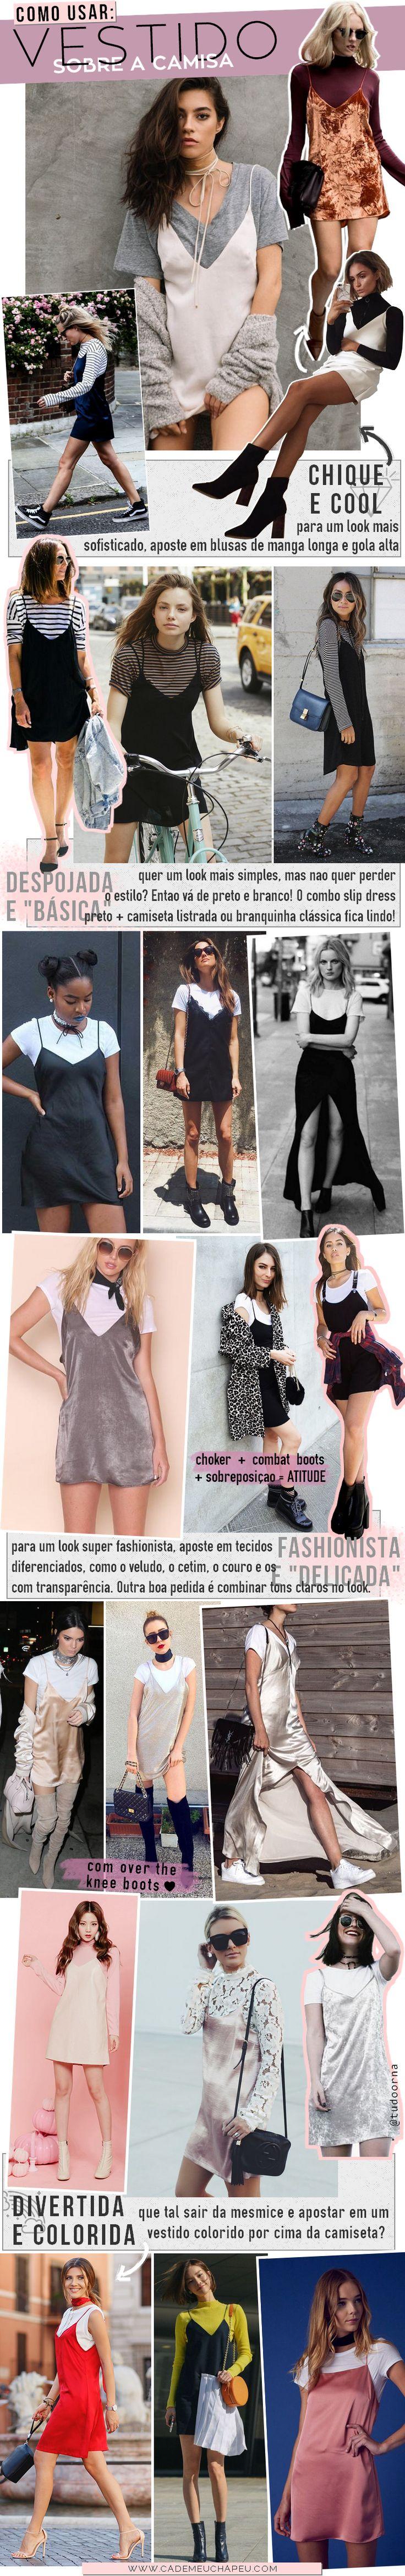 Vestido sobre camisa | Slip dress | Slip dress over t-shirt | Dress and t-shirt | http://cademeuchapeu.com